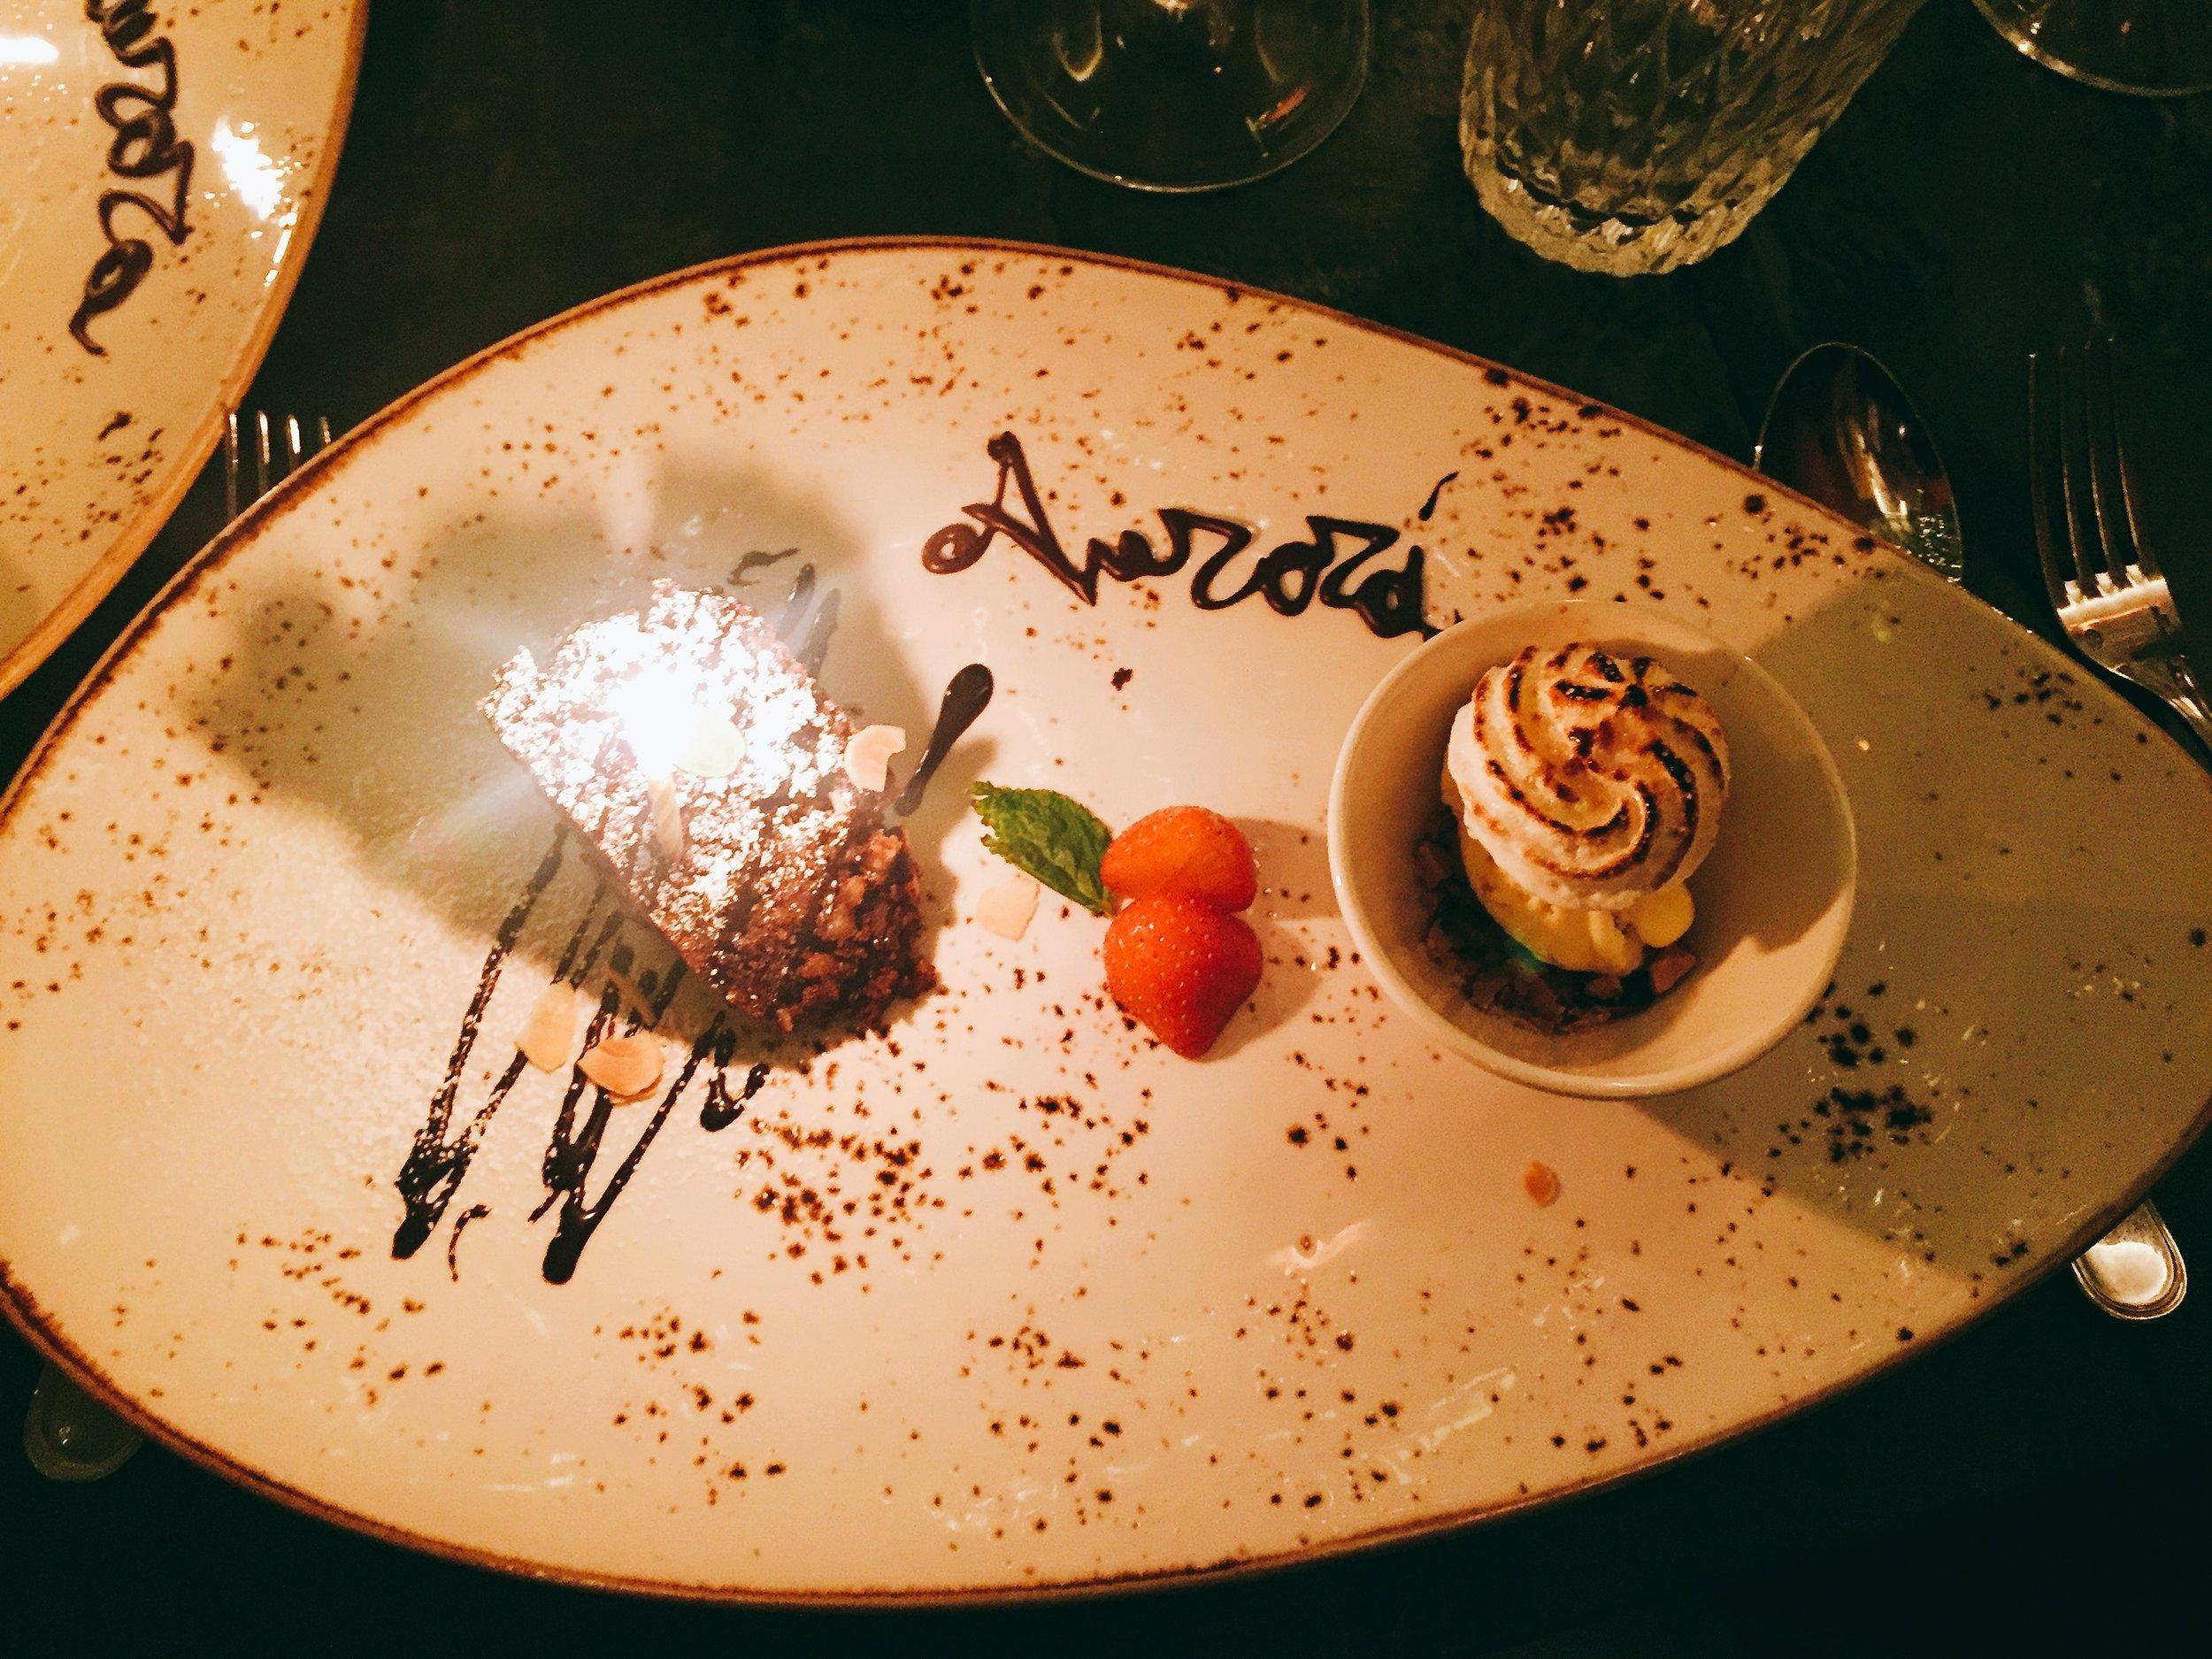 Dessert at Frescobaldi